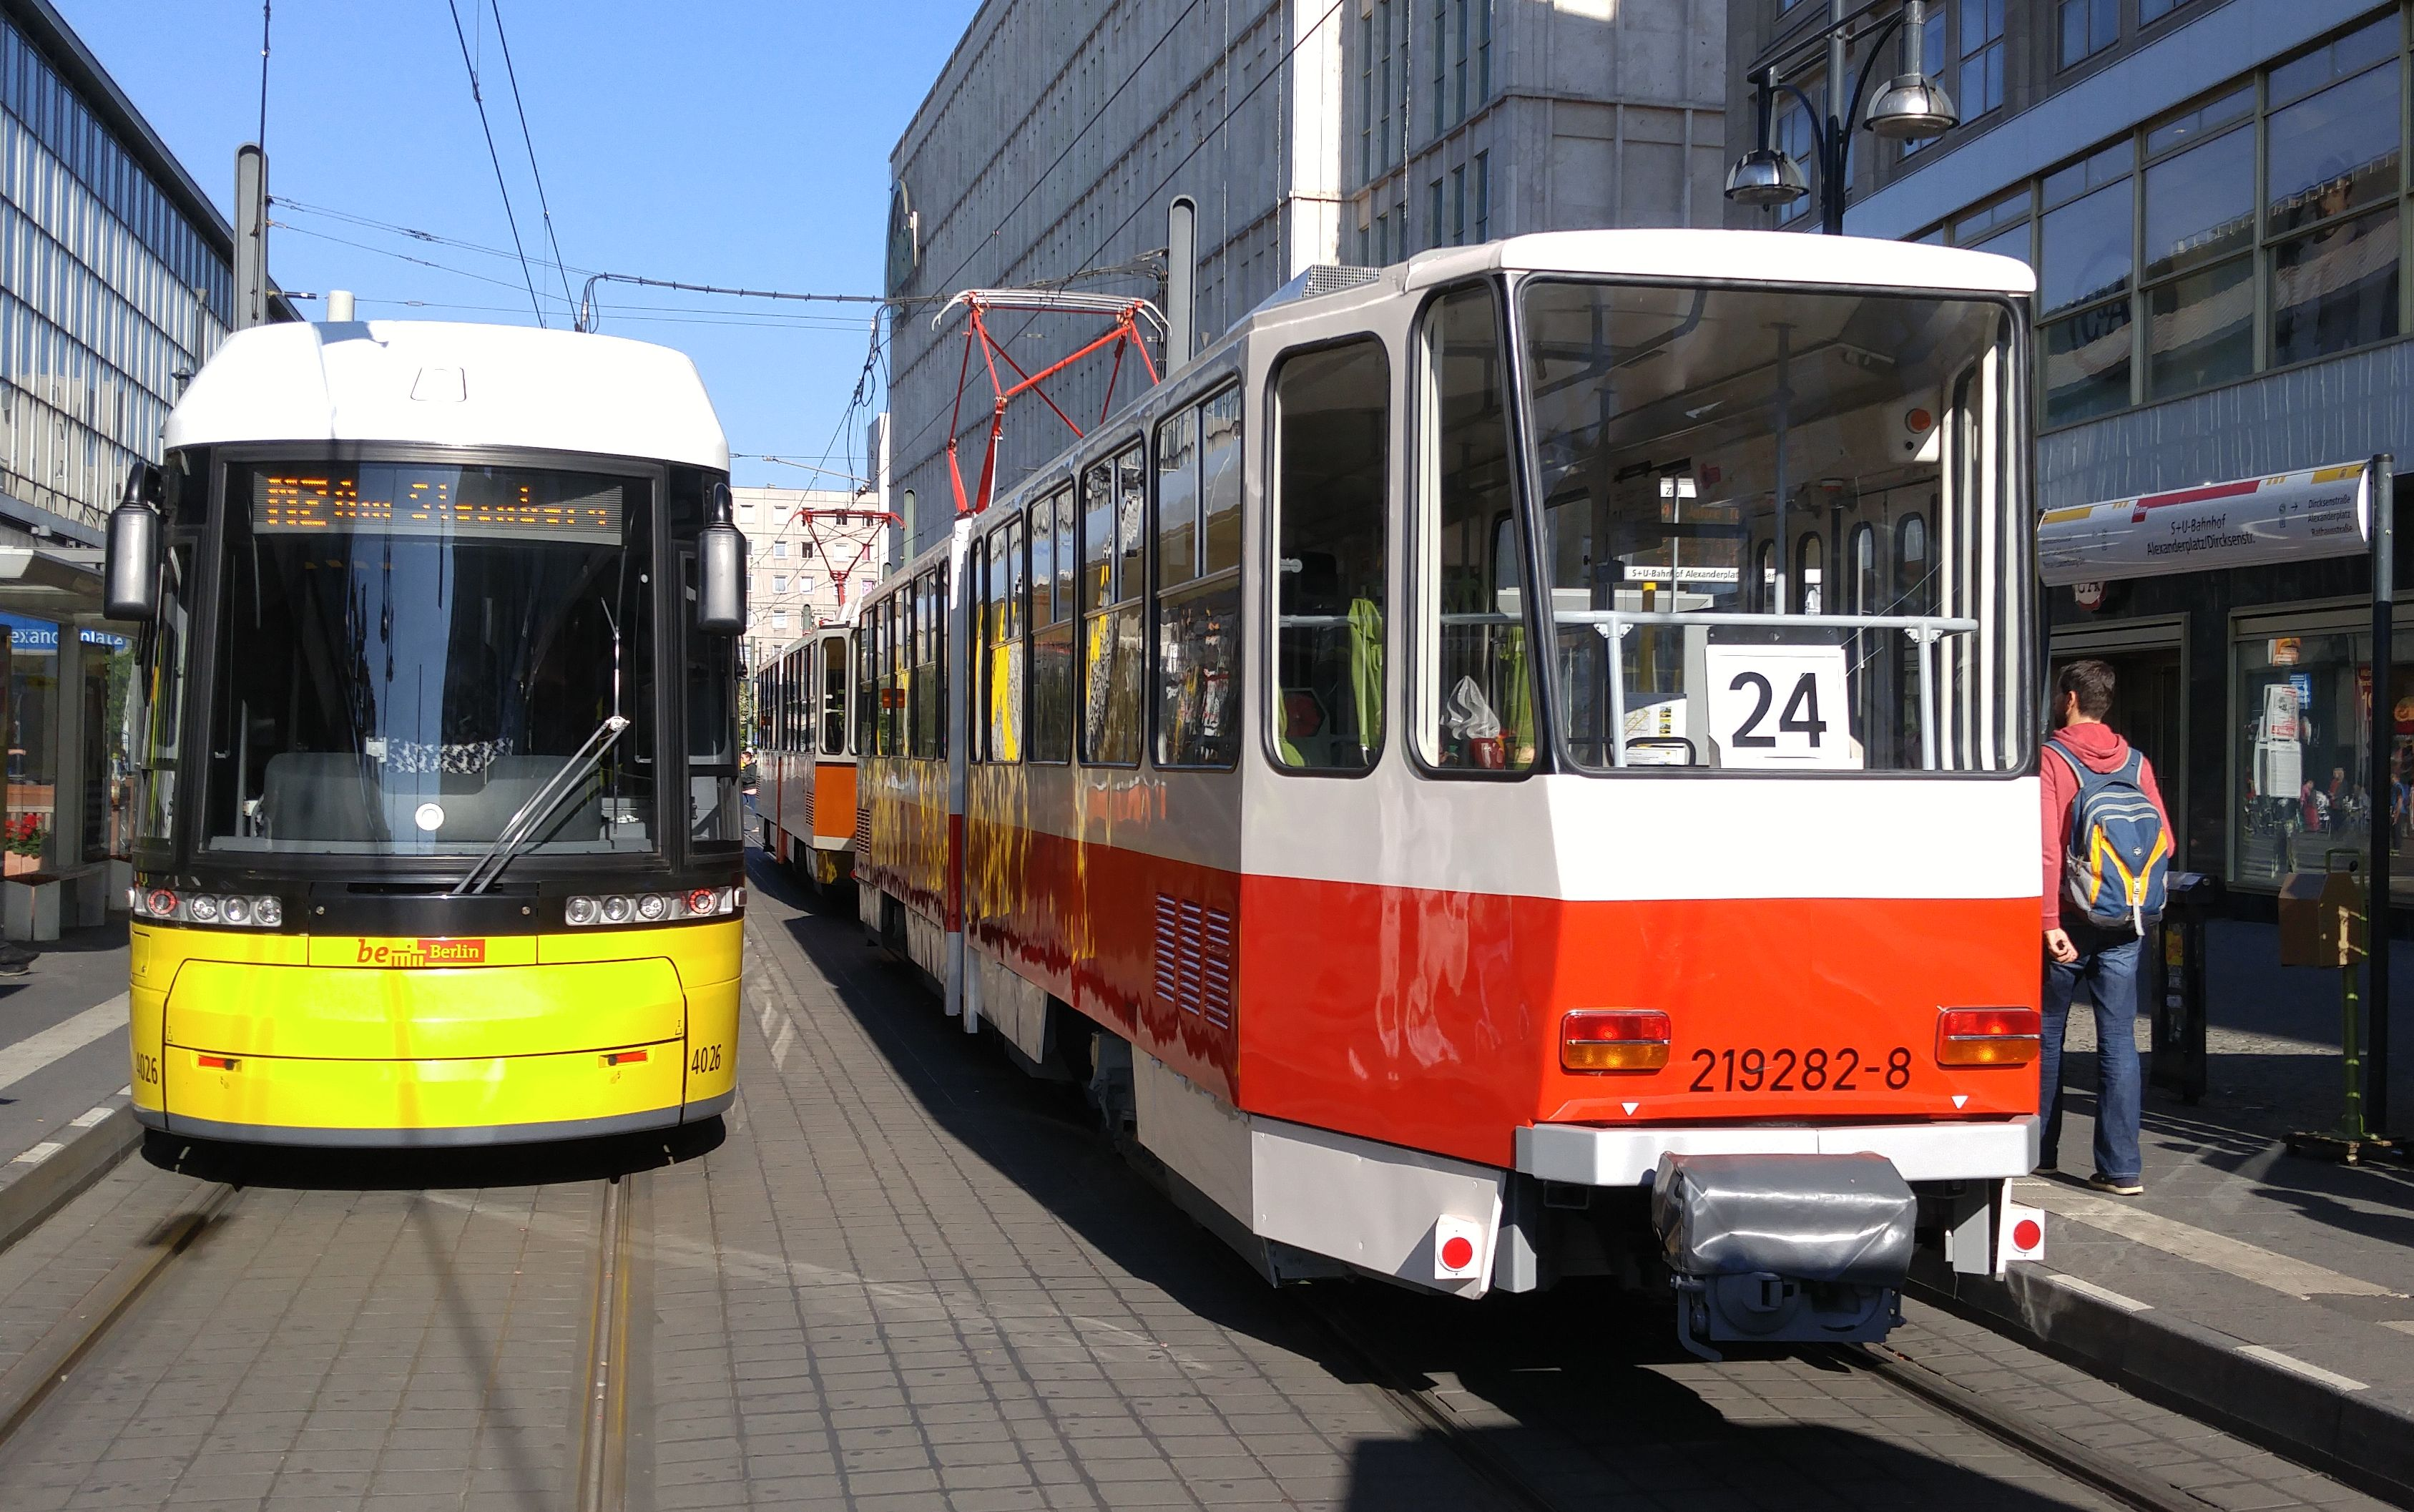 Foto: Straßenbahn 219 282, Typ Tatra KT4D, Alexanderplatz, 2016